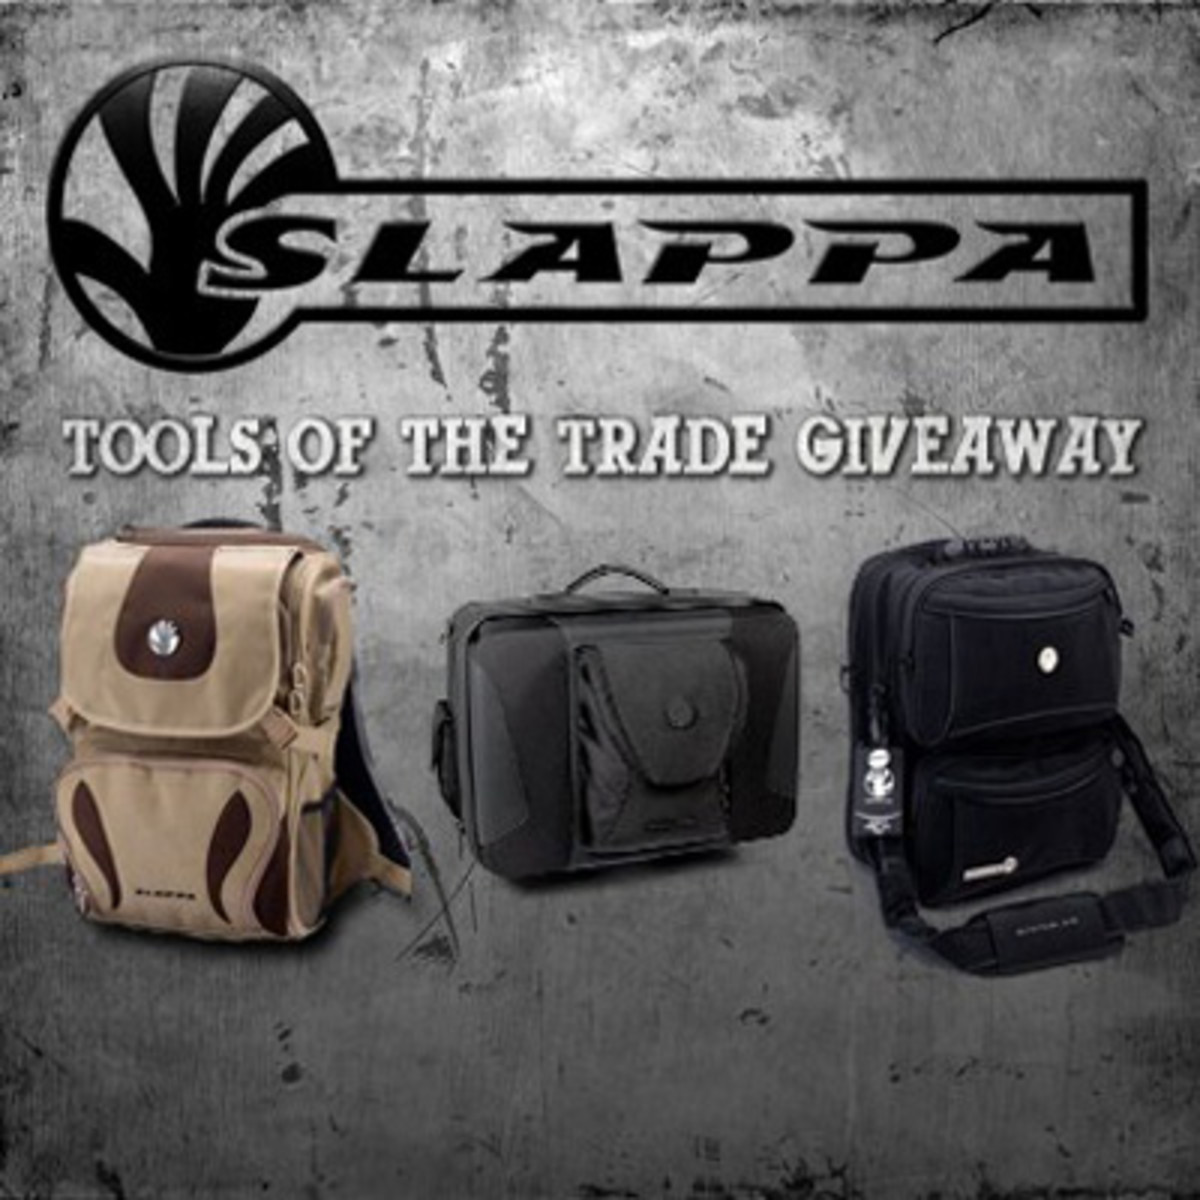 slappa-giveaway.jpg